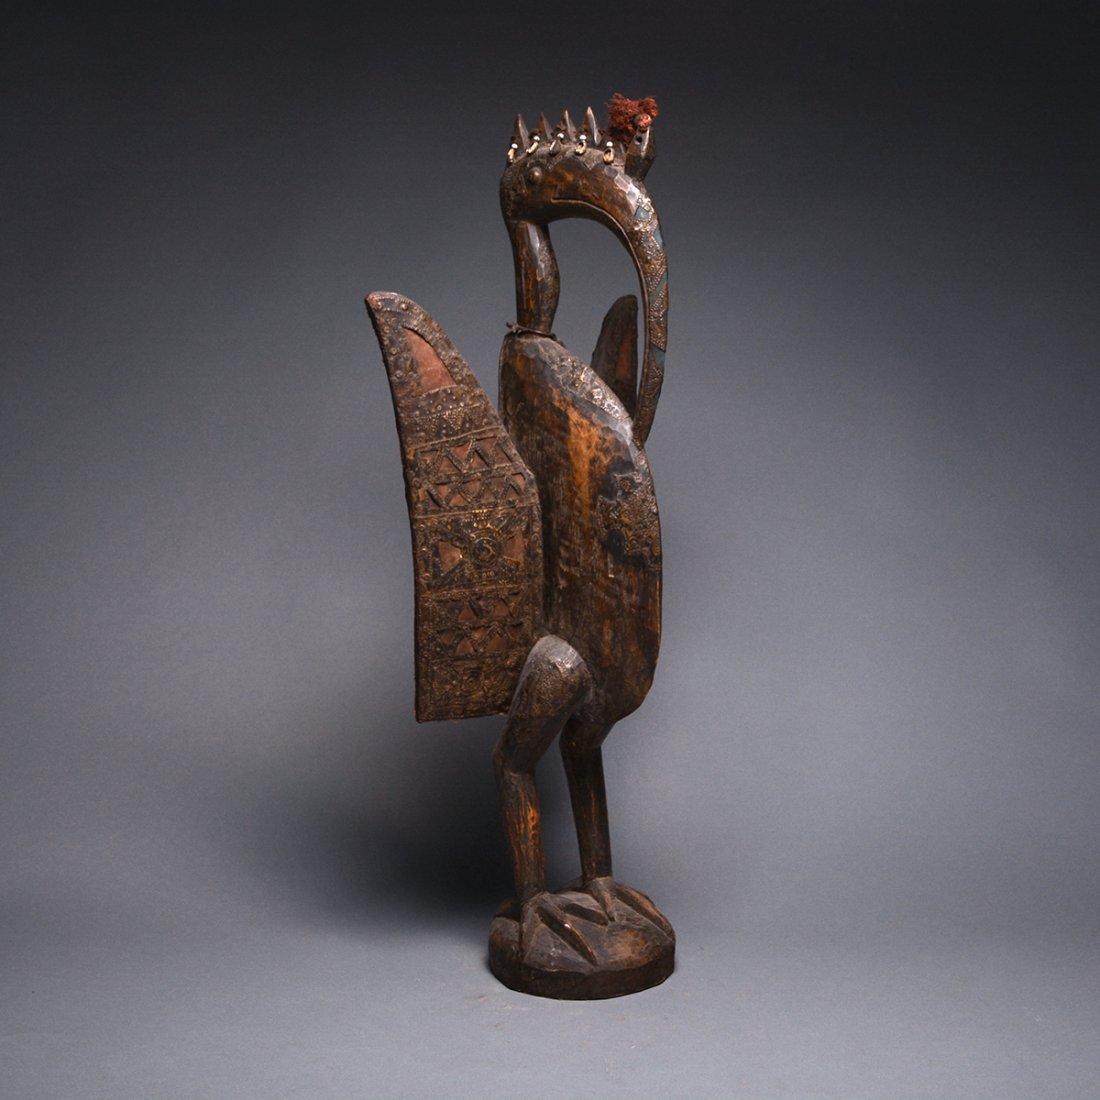 A Senufo Wood and Metal Sculpture of a Bird